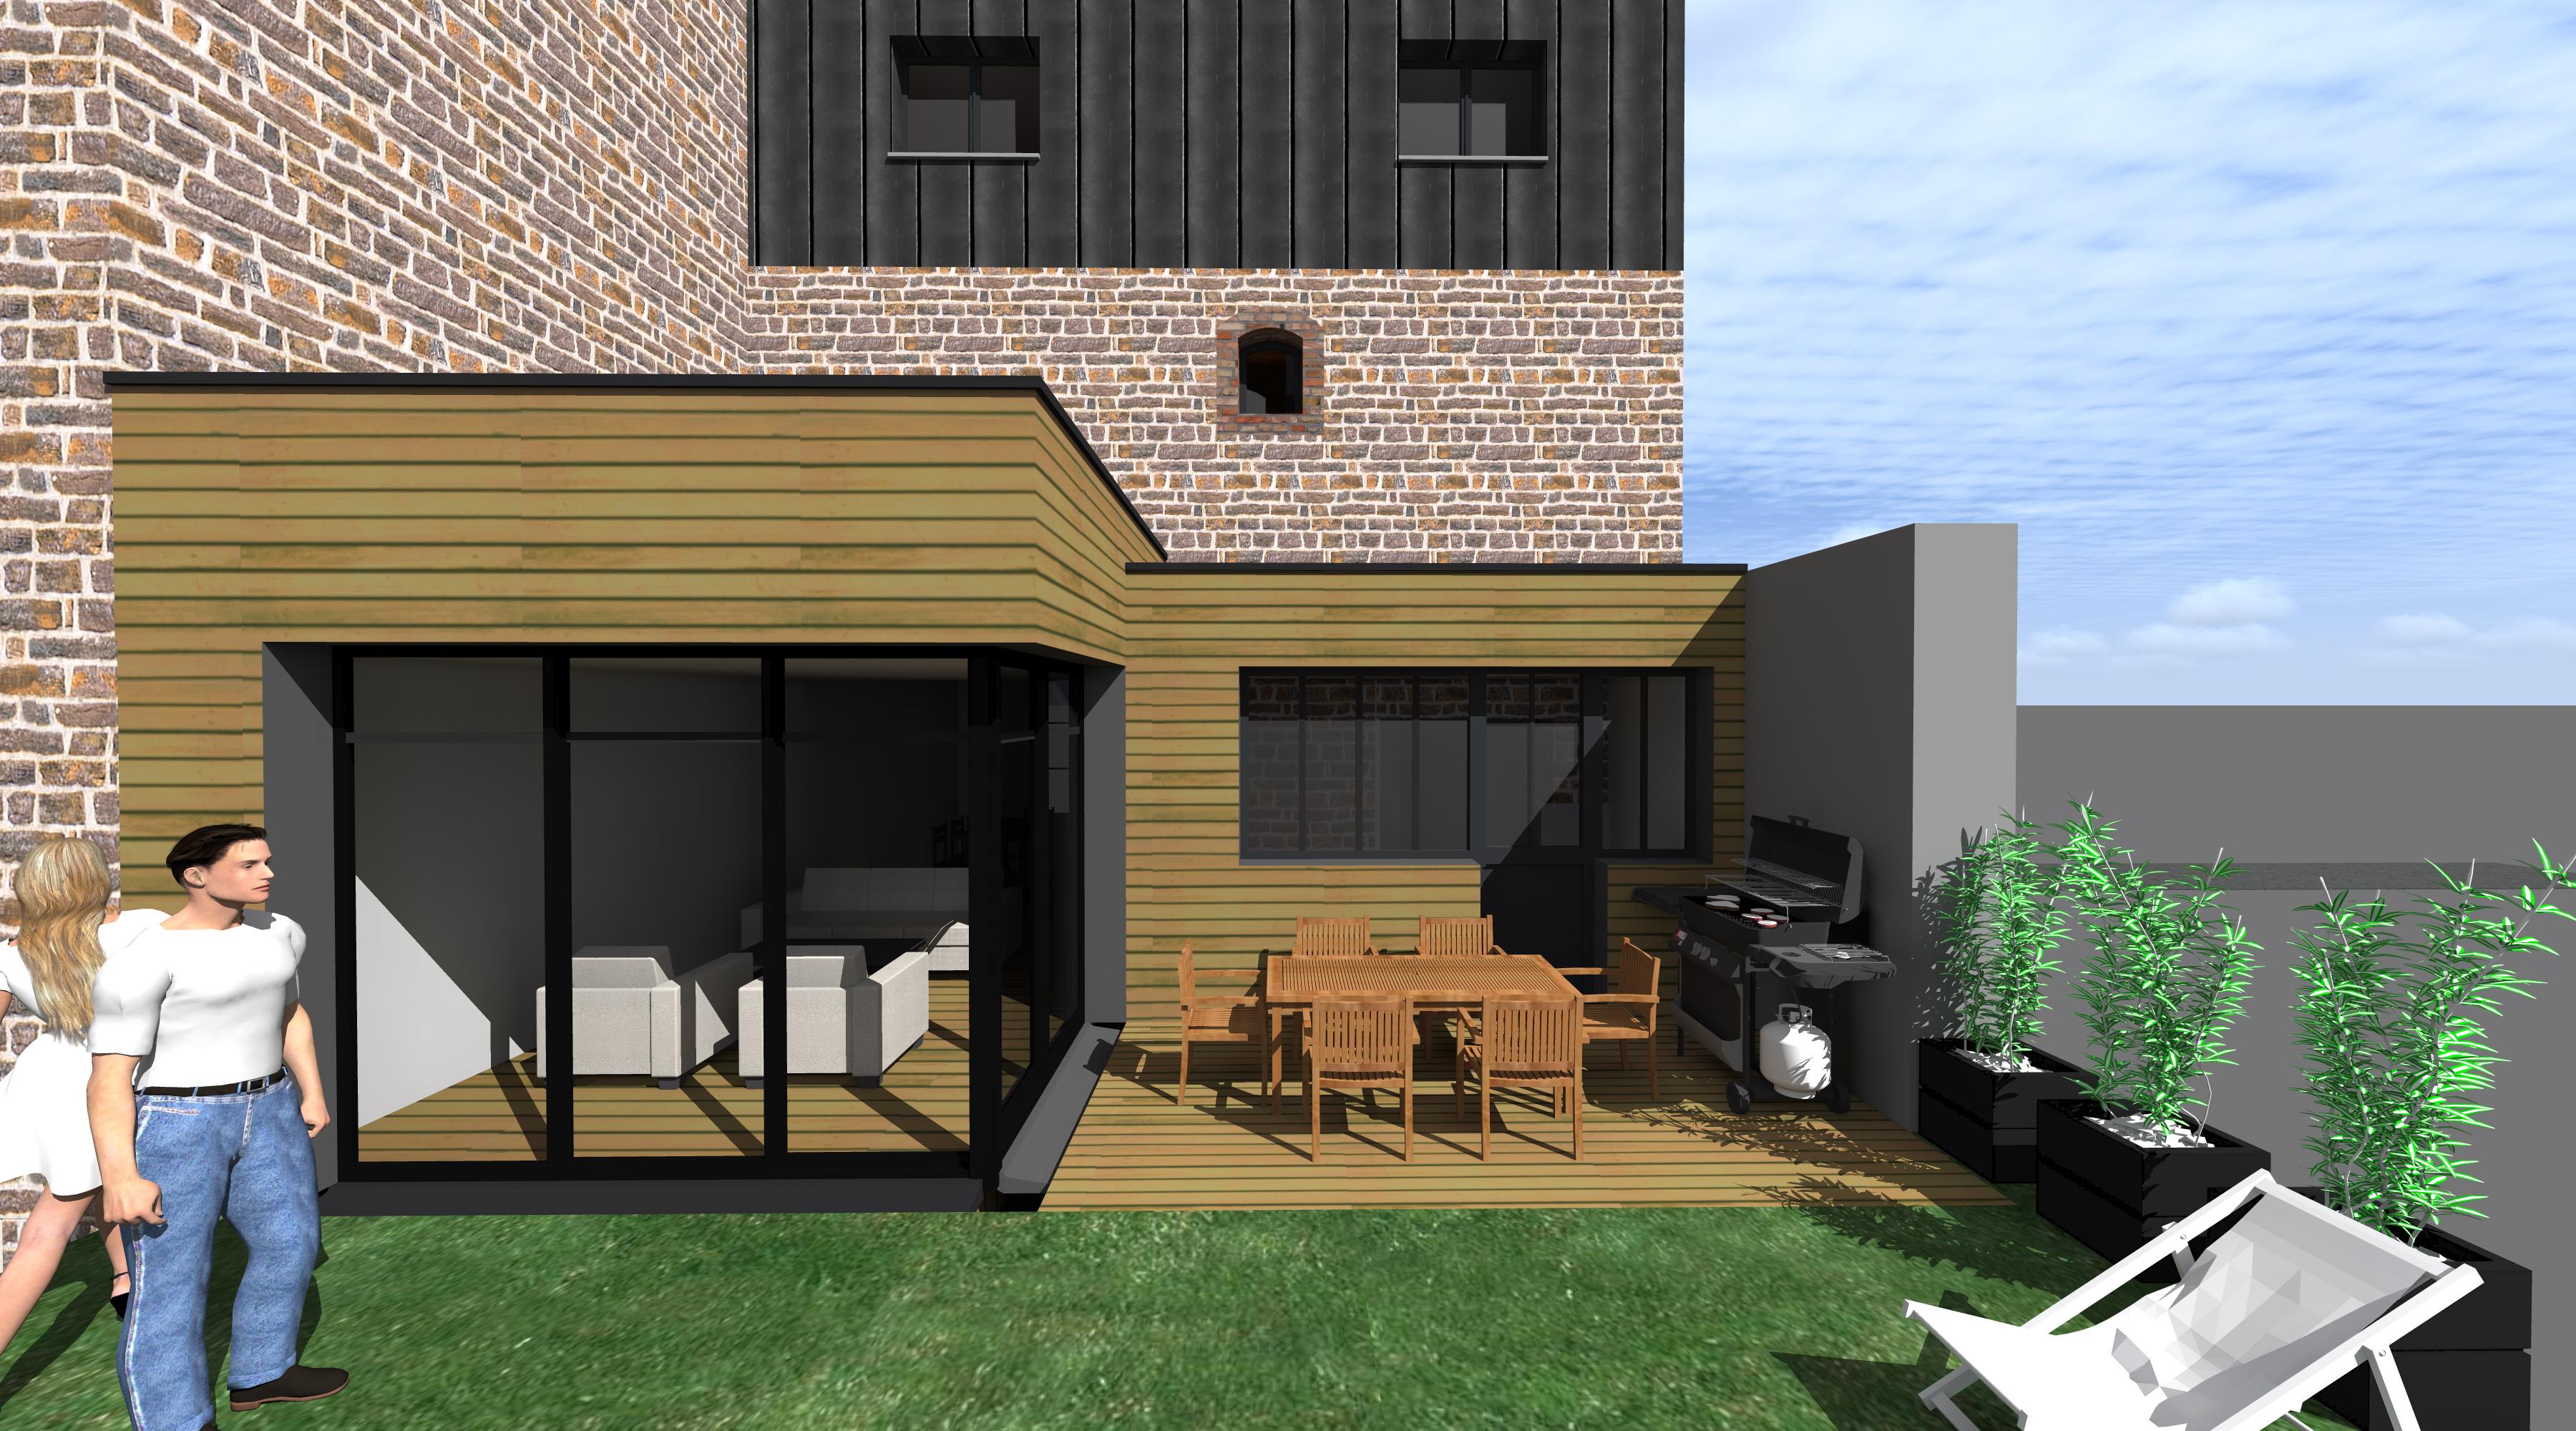 Projet gg r 1 2 vue architecte lise roturier for Agrandissement maison rennes